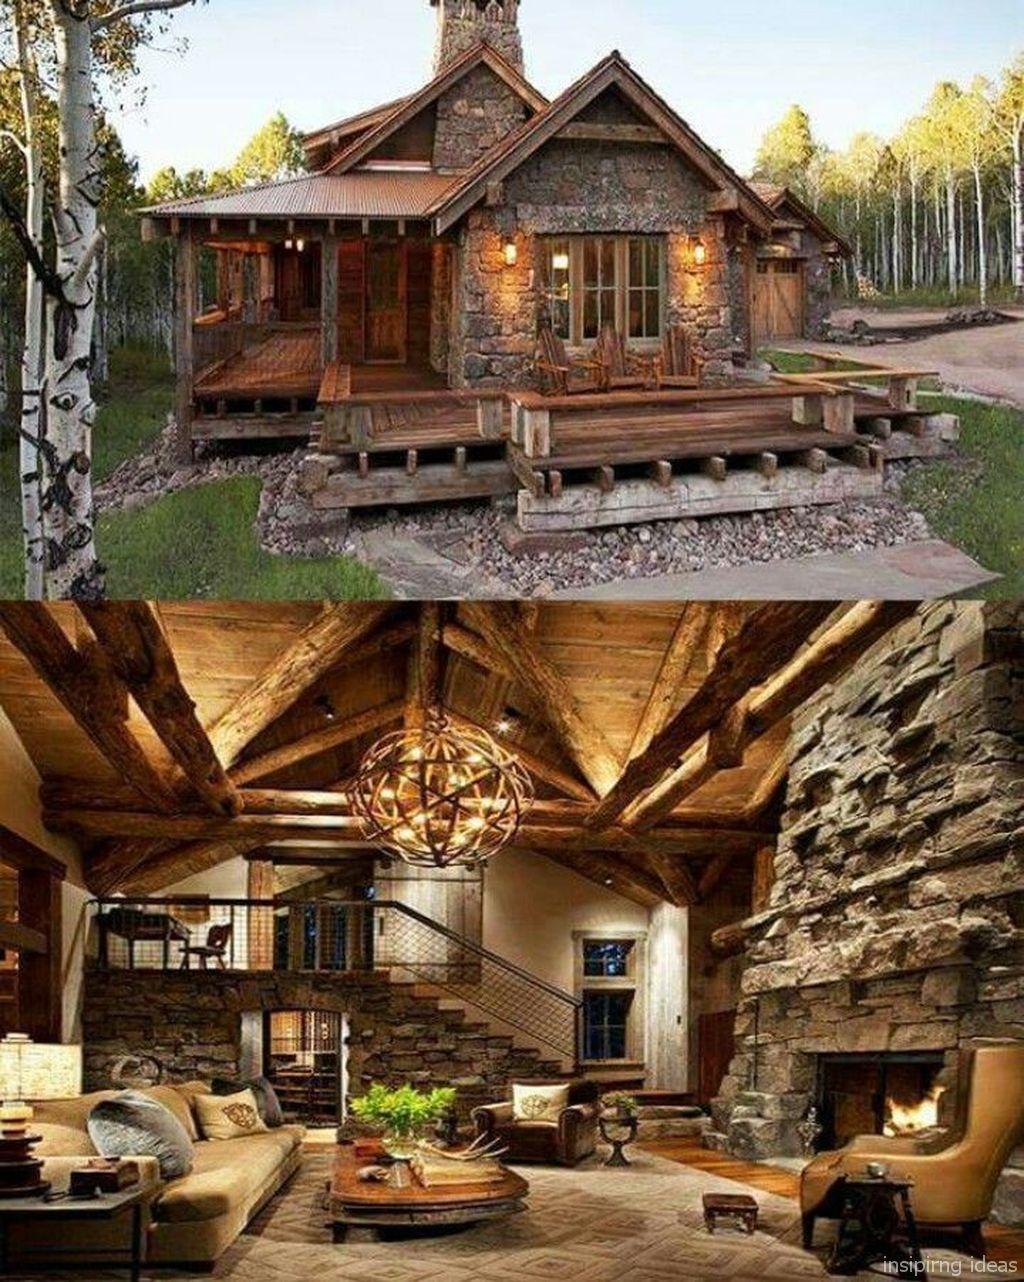 Design Of Rustic Log Cabins